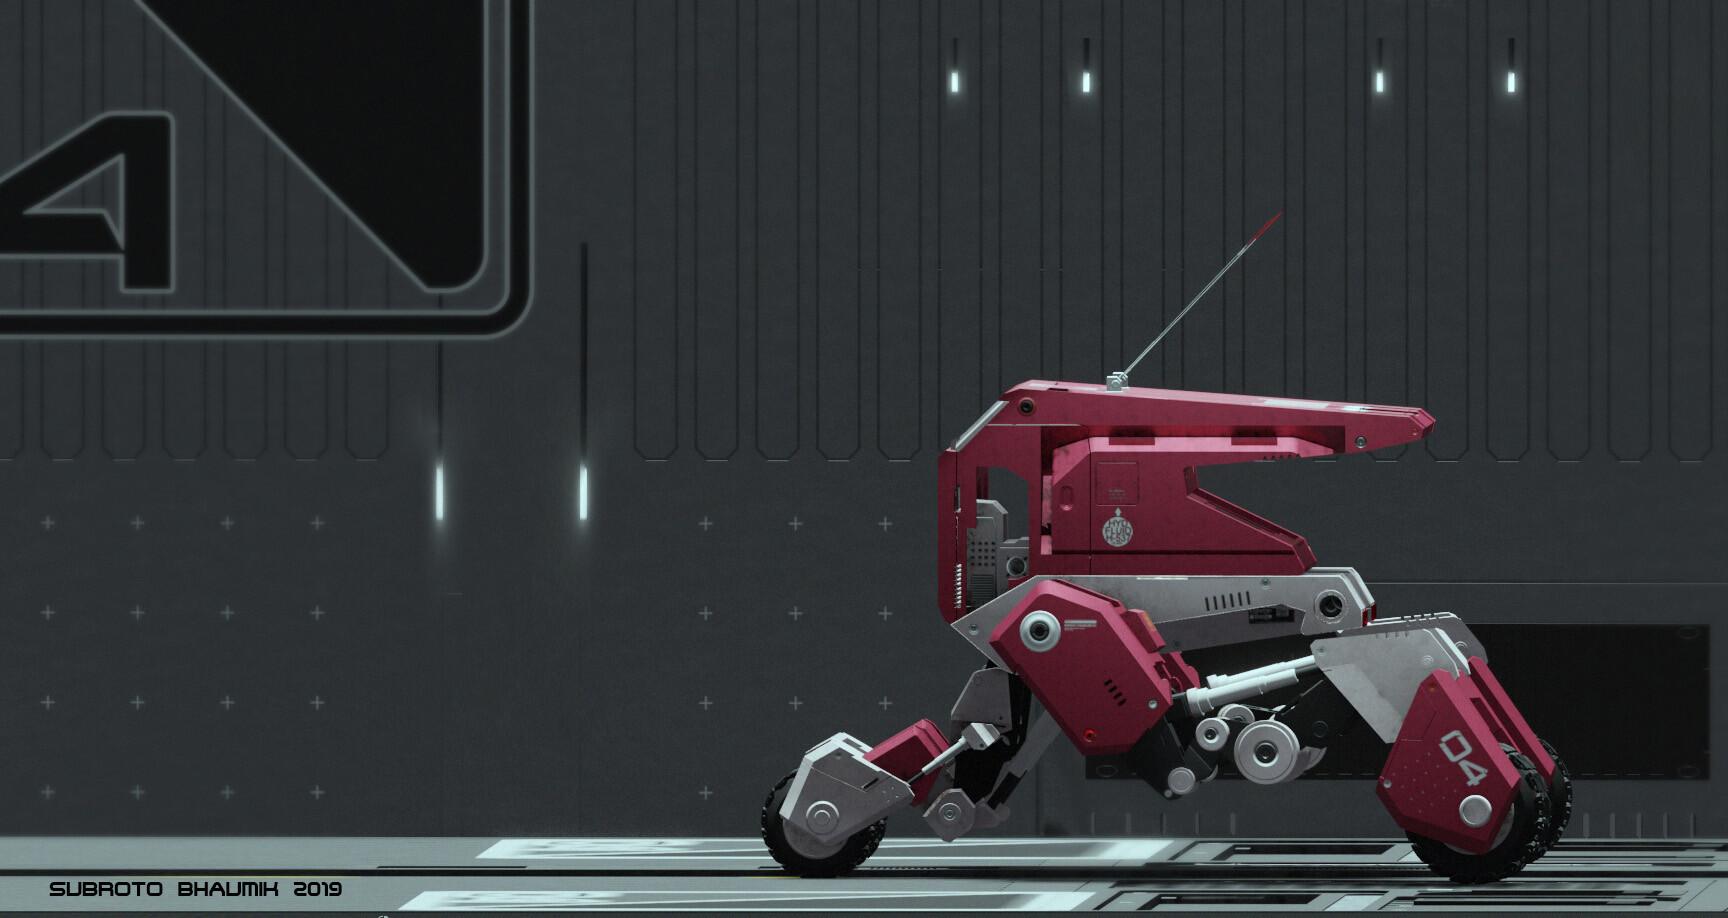 Subroto bhaumik blenderbot3